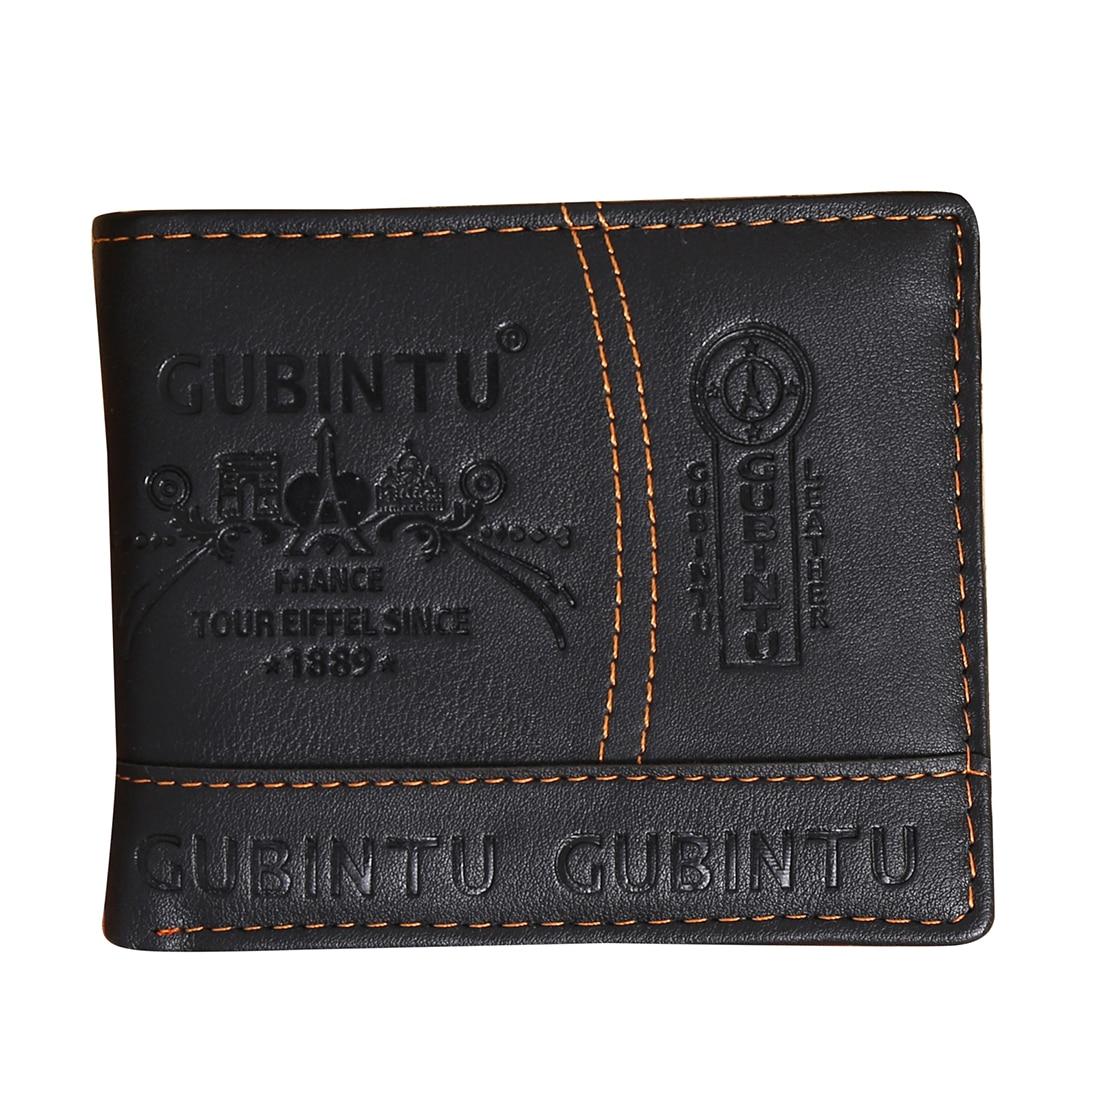 Mens Luxury Leather Bifold Wallet Credit/ID Card Receipt Holder Slim Coin Purse vsen hot men luxury leather card cash receipt holder organizer bifold wallet coin purse